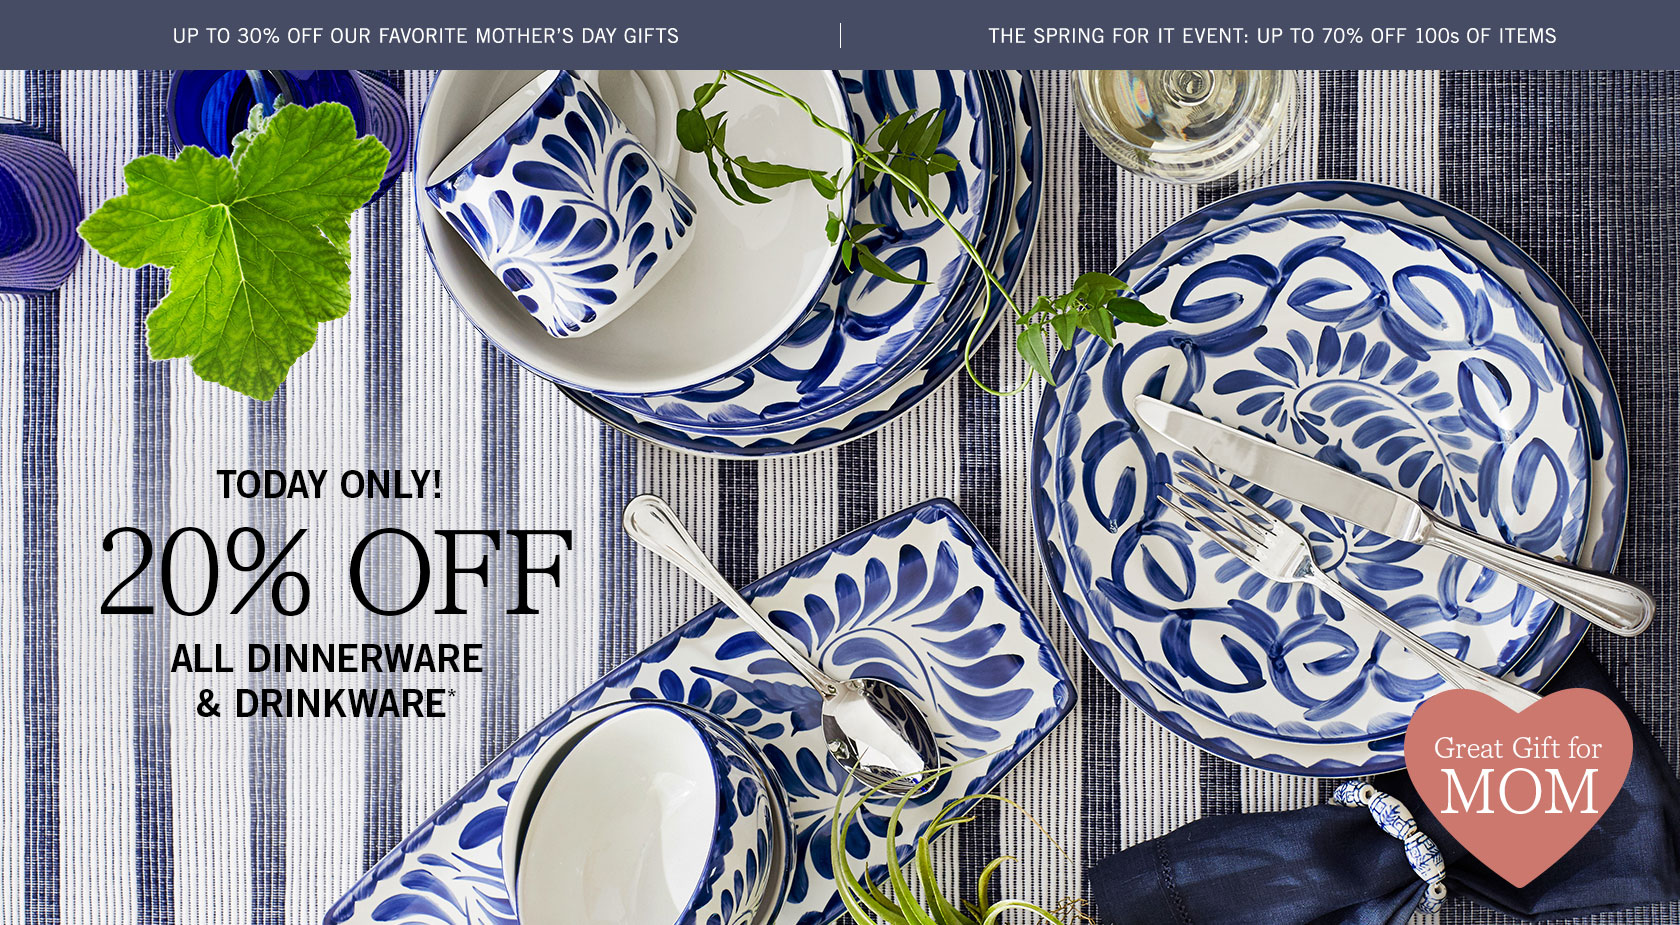 Pottery barn celeste chandelier - Dinnerware Drinkware Sale